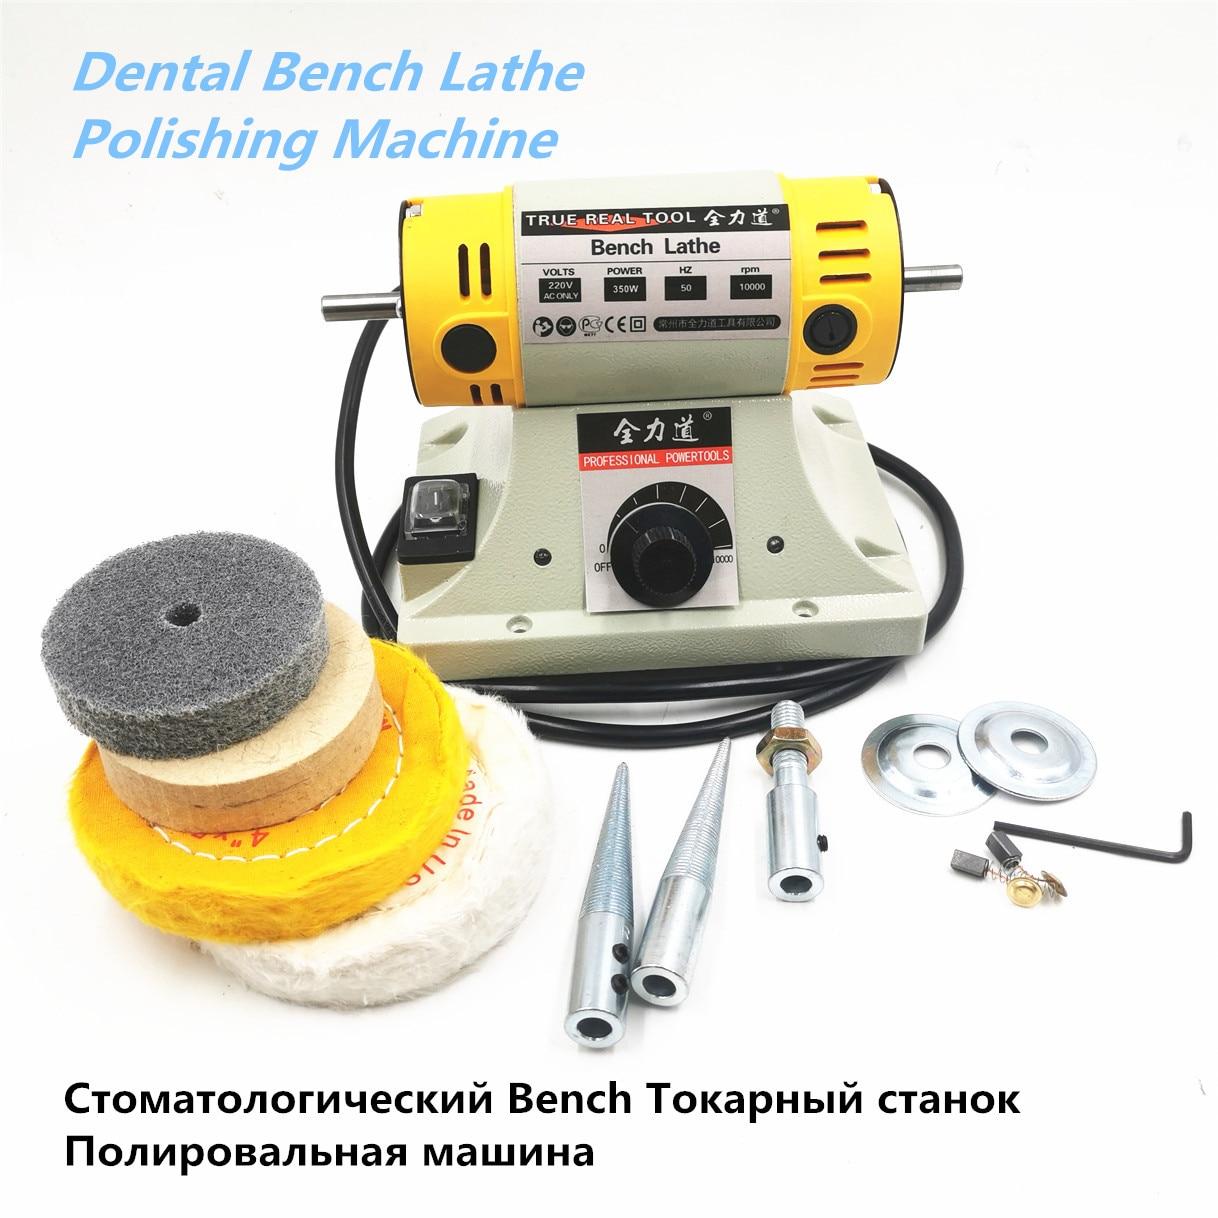 Hot Deals350w-Polishing-Machine Dental-Bench Woodworking Jadejewelry 220V for DIY